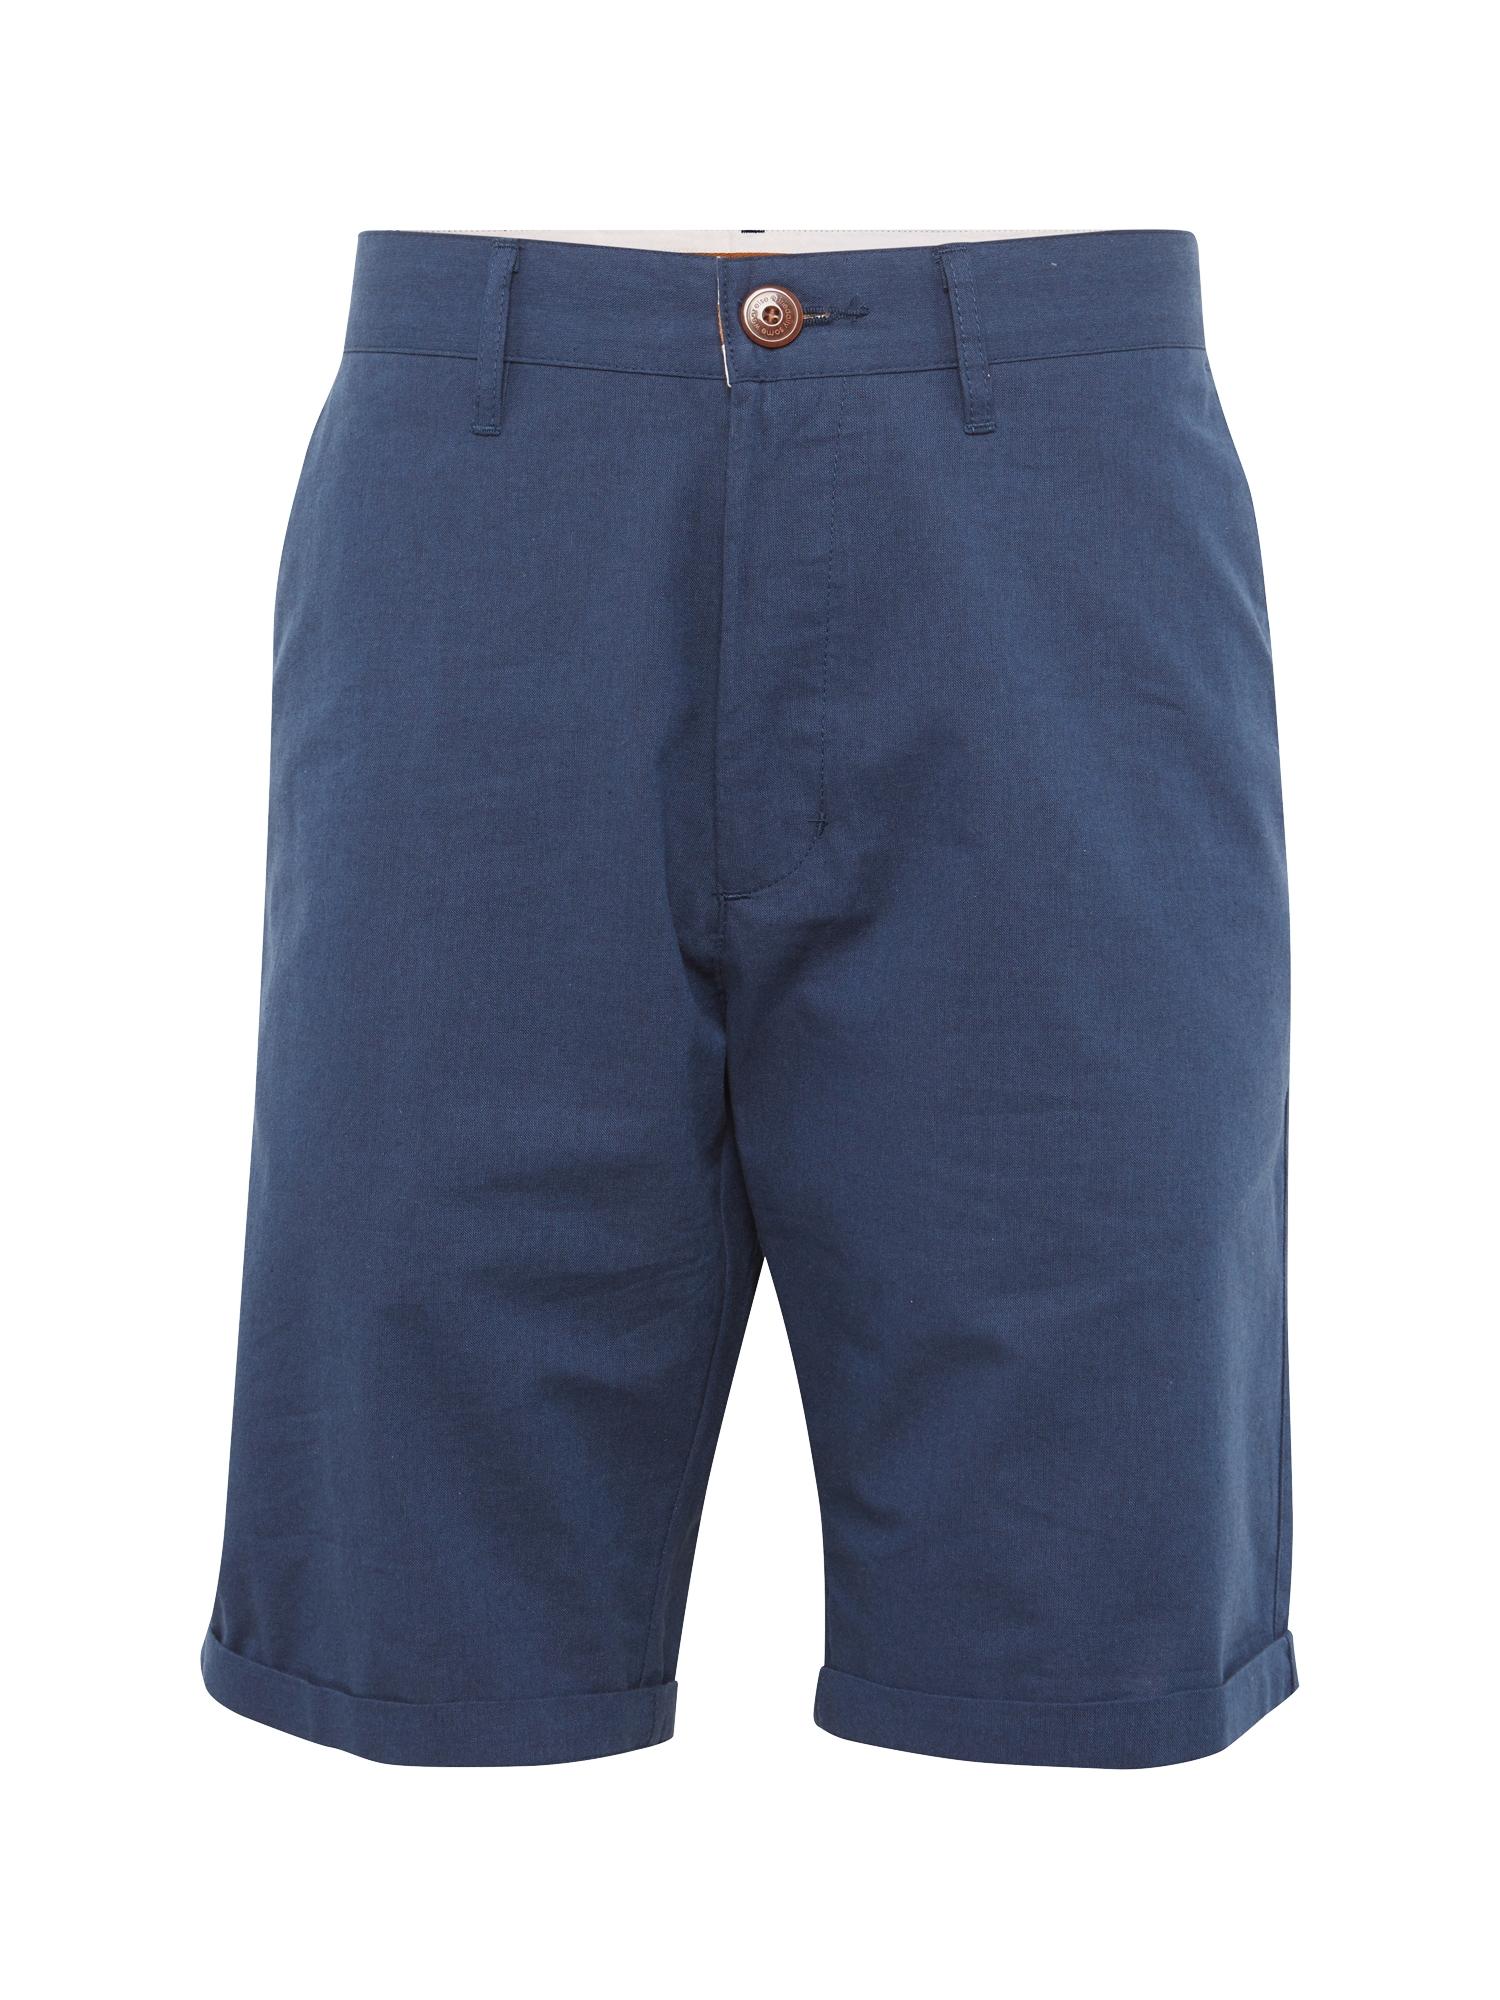 Chino kalhoty Golfer Chambray marine modrá Iriedaily